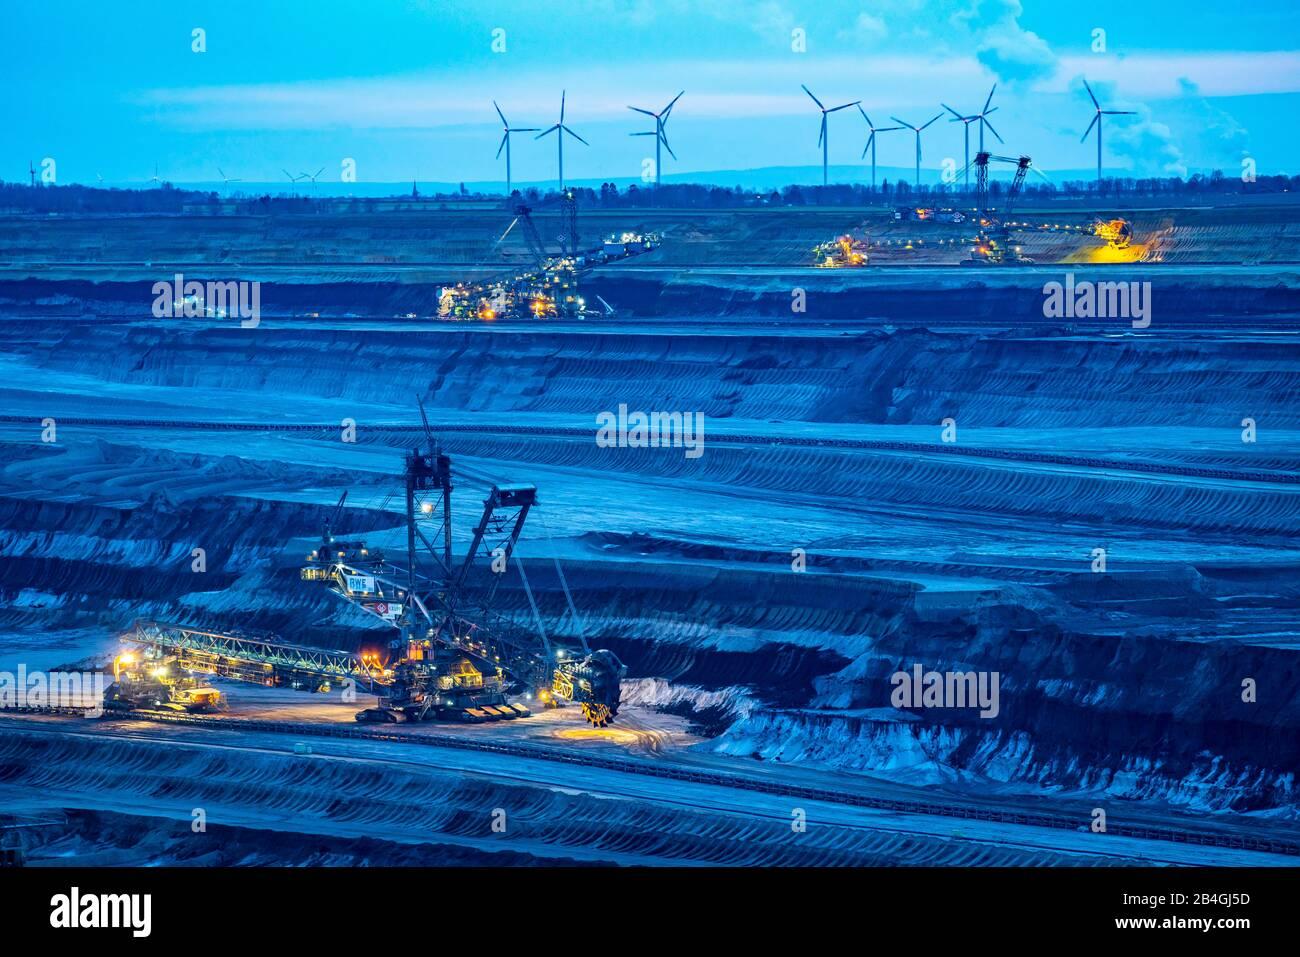 Lignite opencast mine Garzweiler II, bucket wheel excavator excavating lignite, front, Germany, Stock Photo